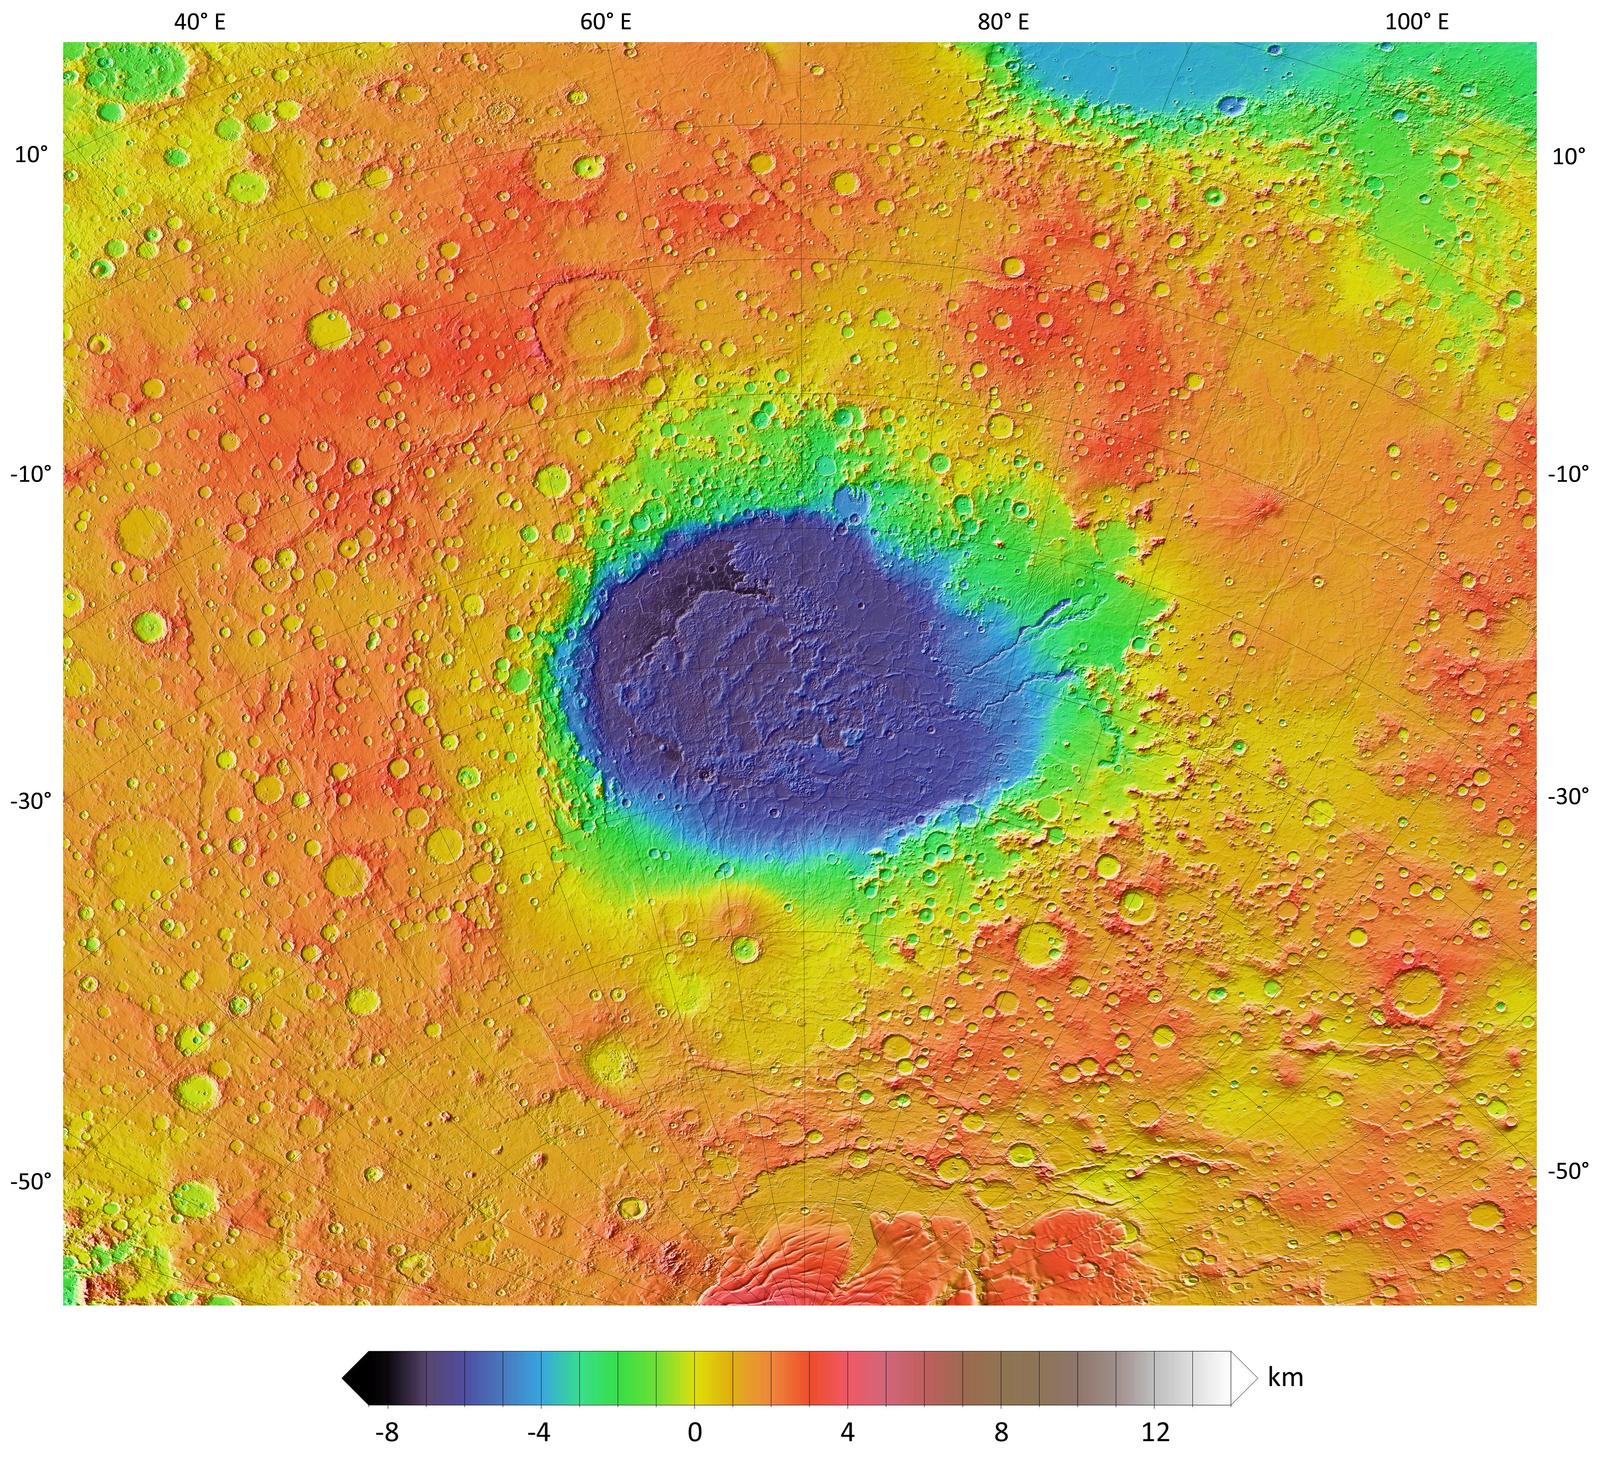 Topographic Map Of Hellas Planitia Nasa S Insight Mars Lander